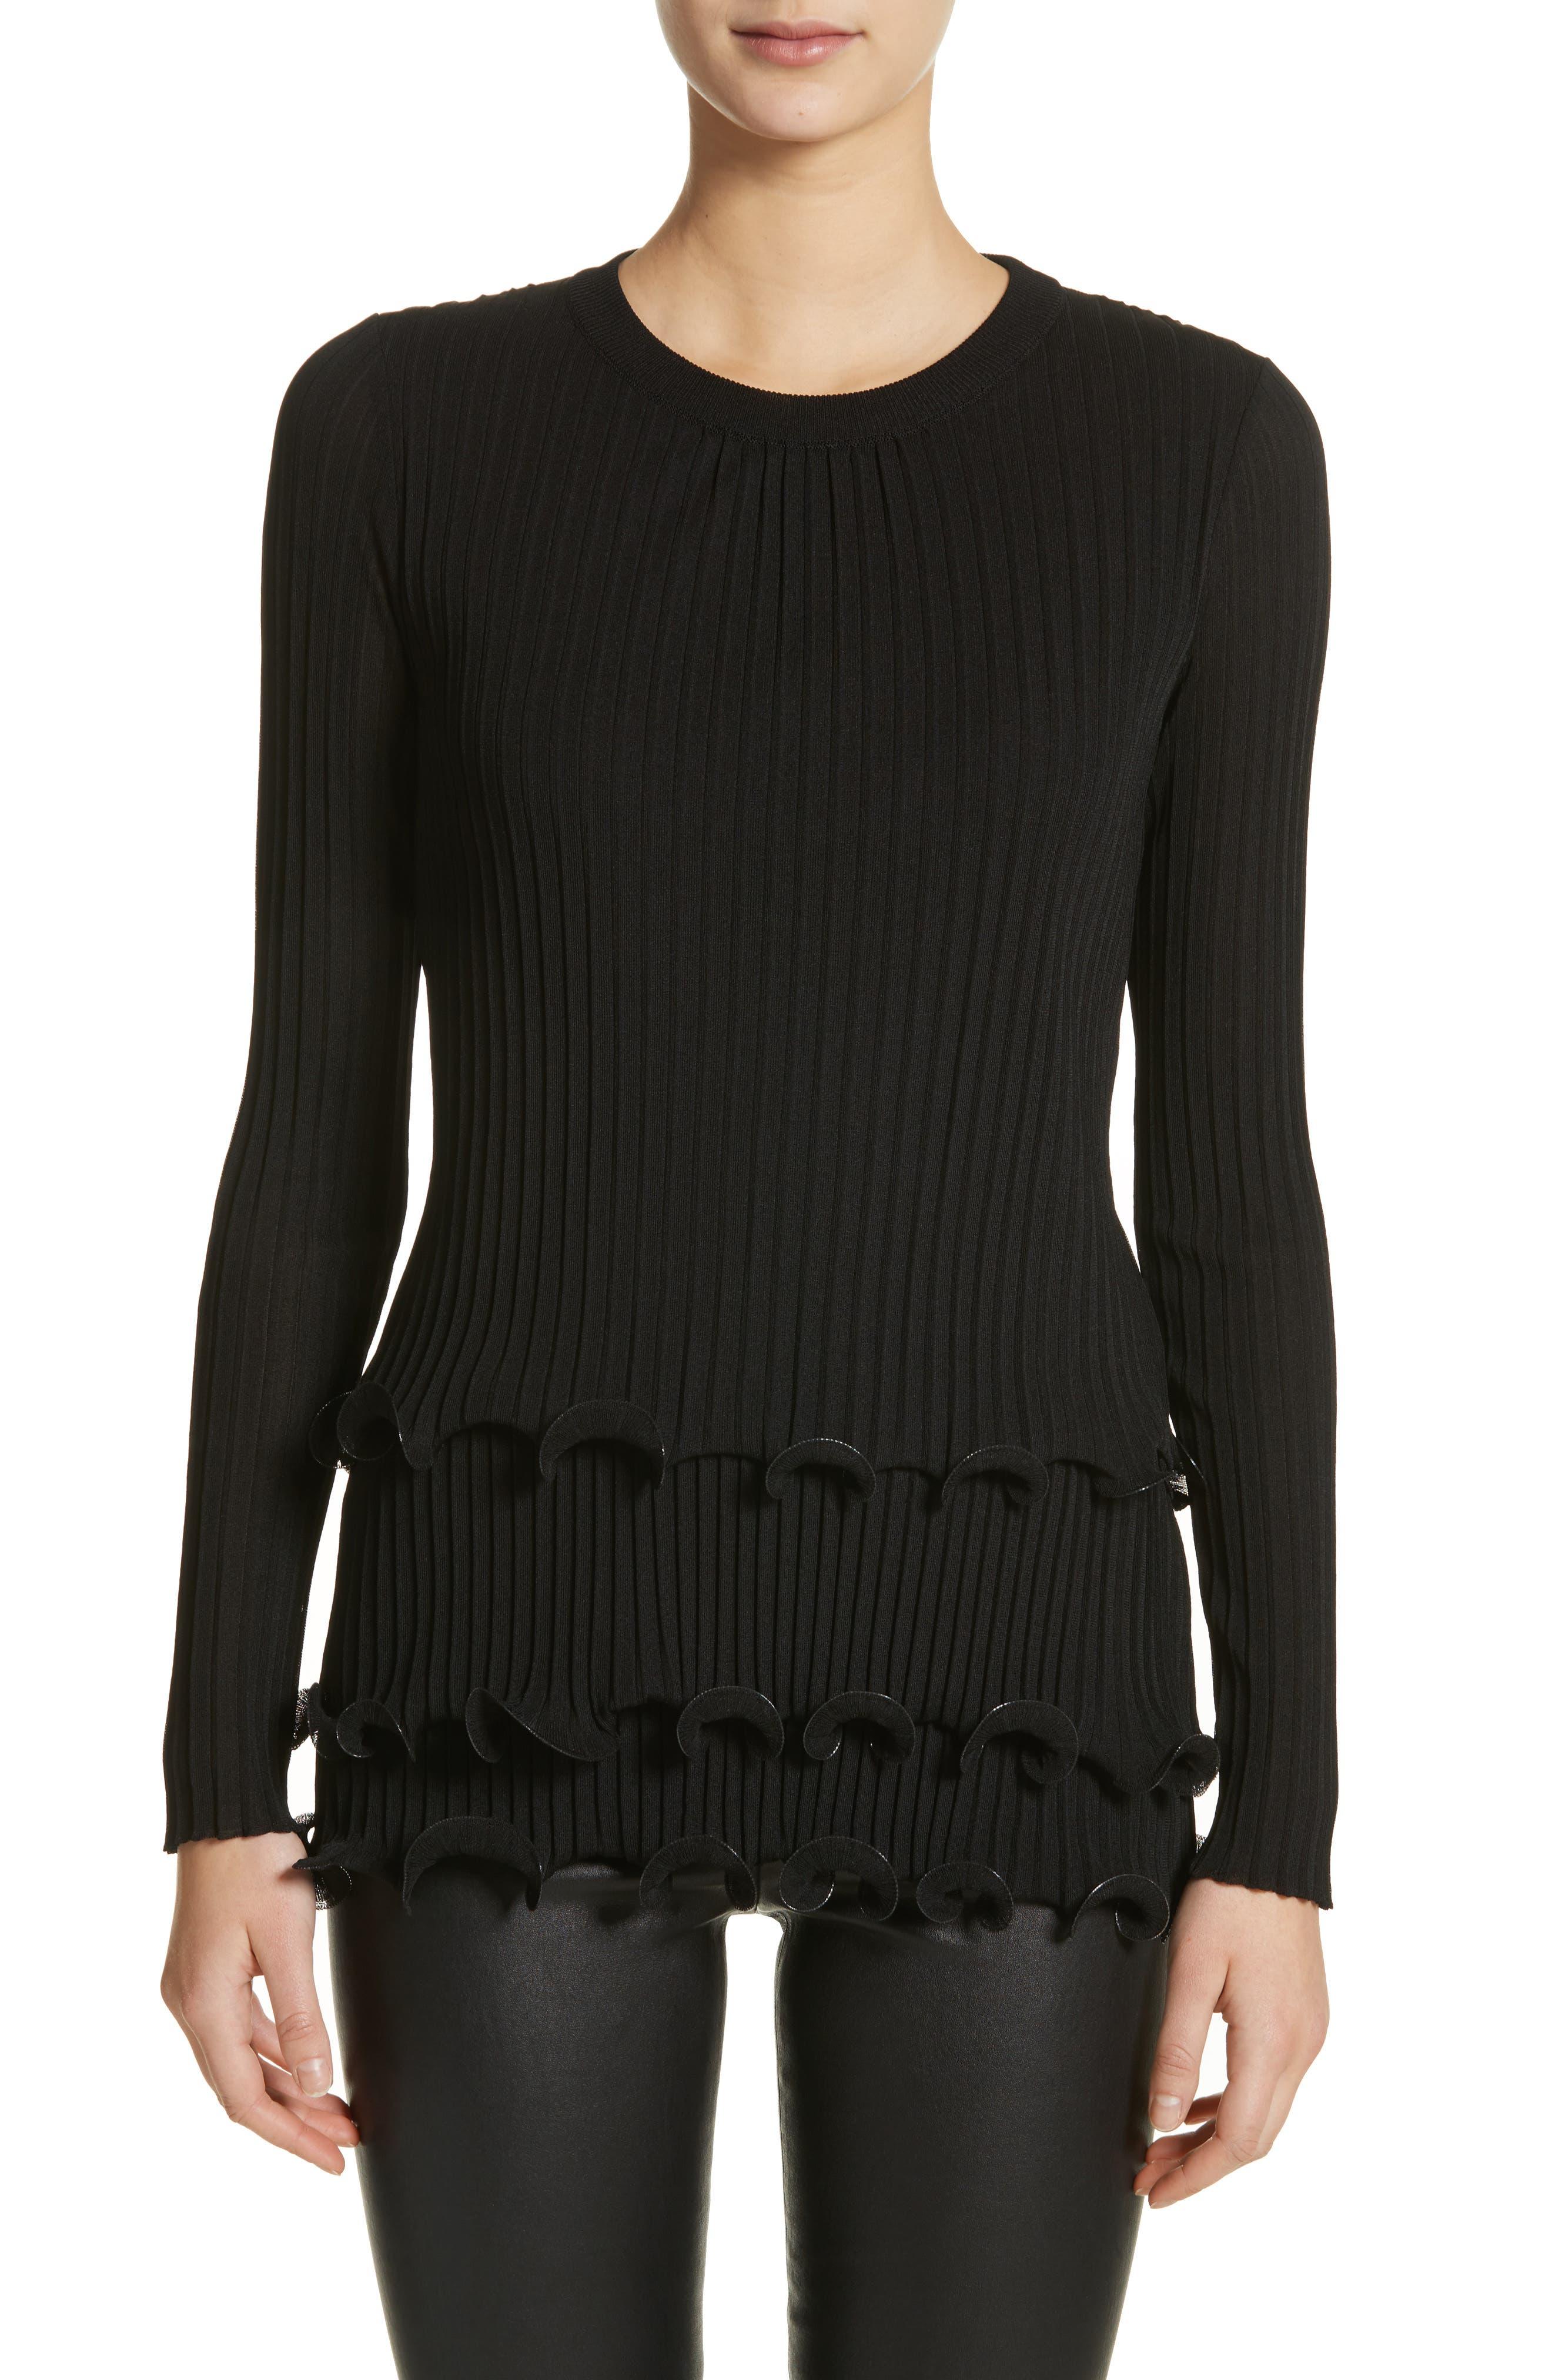 Main Image - Givenchy Ruffle Hem Rib Knit Top